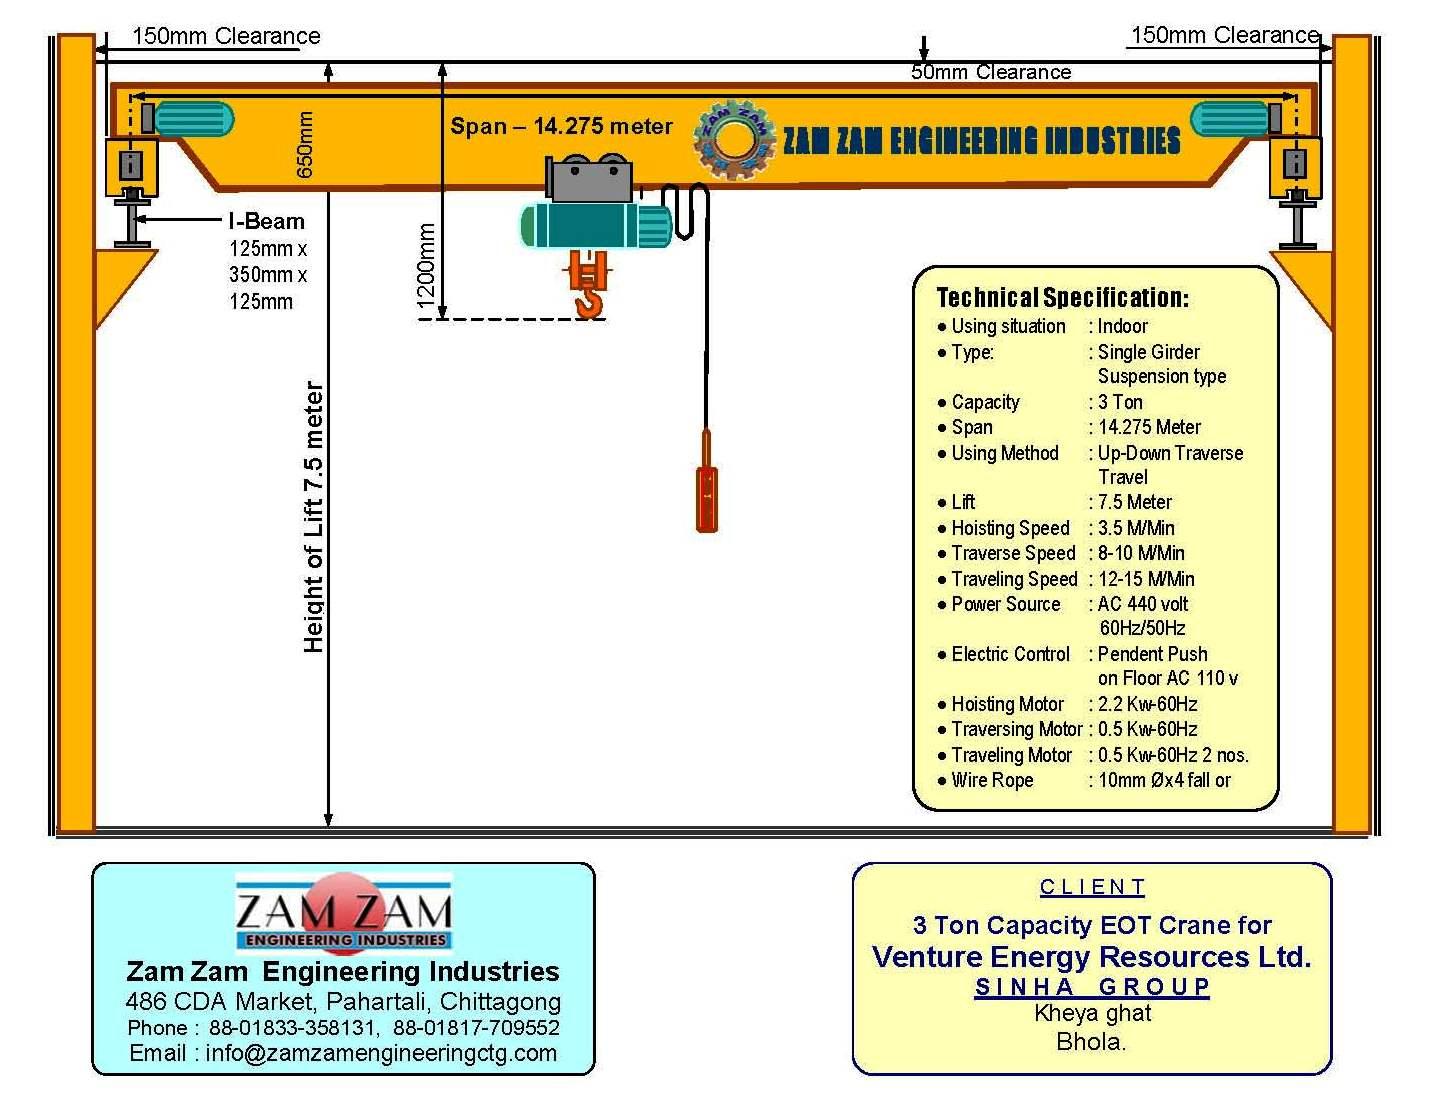 EOT Crane Drawing 3Ton SINHA Venture Energy.2014?resize\\\\\\\=665%2C510 crane hi 4 wiring diagram revtech 100 diagram, badlands badlands illuminator wiring diagram at suagrazia.org